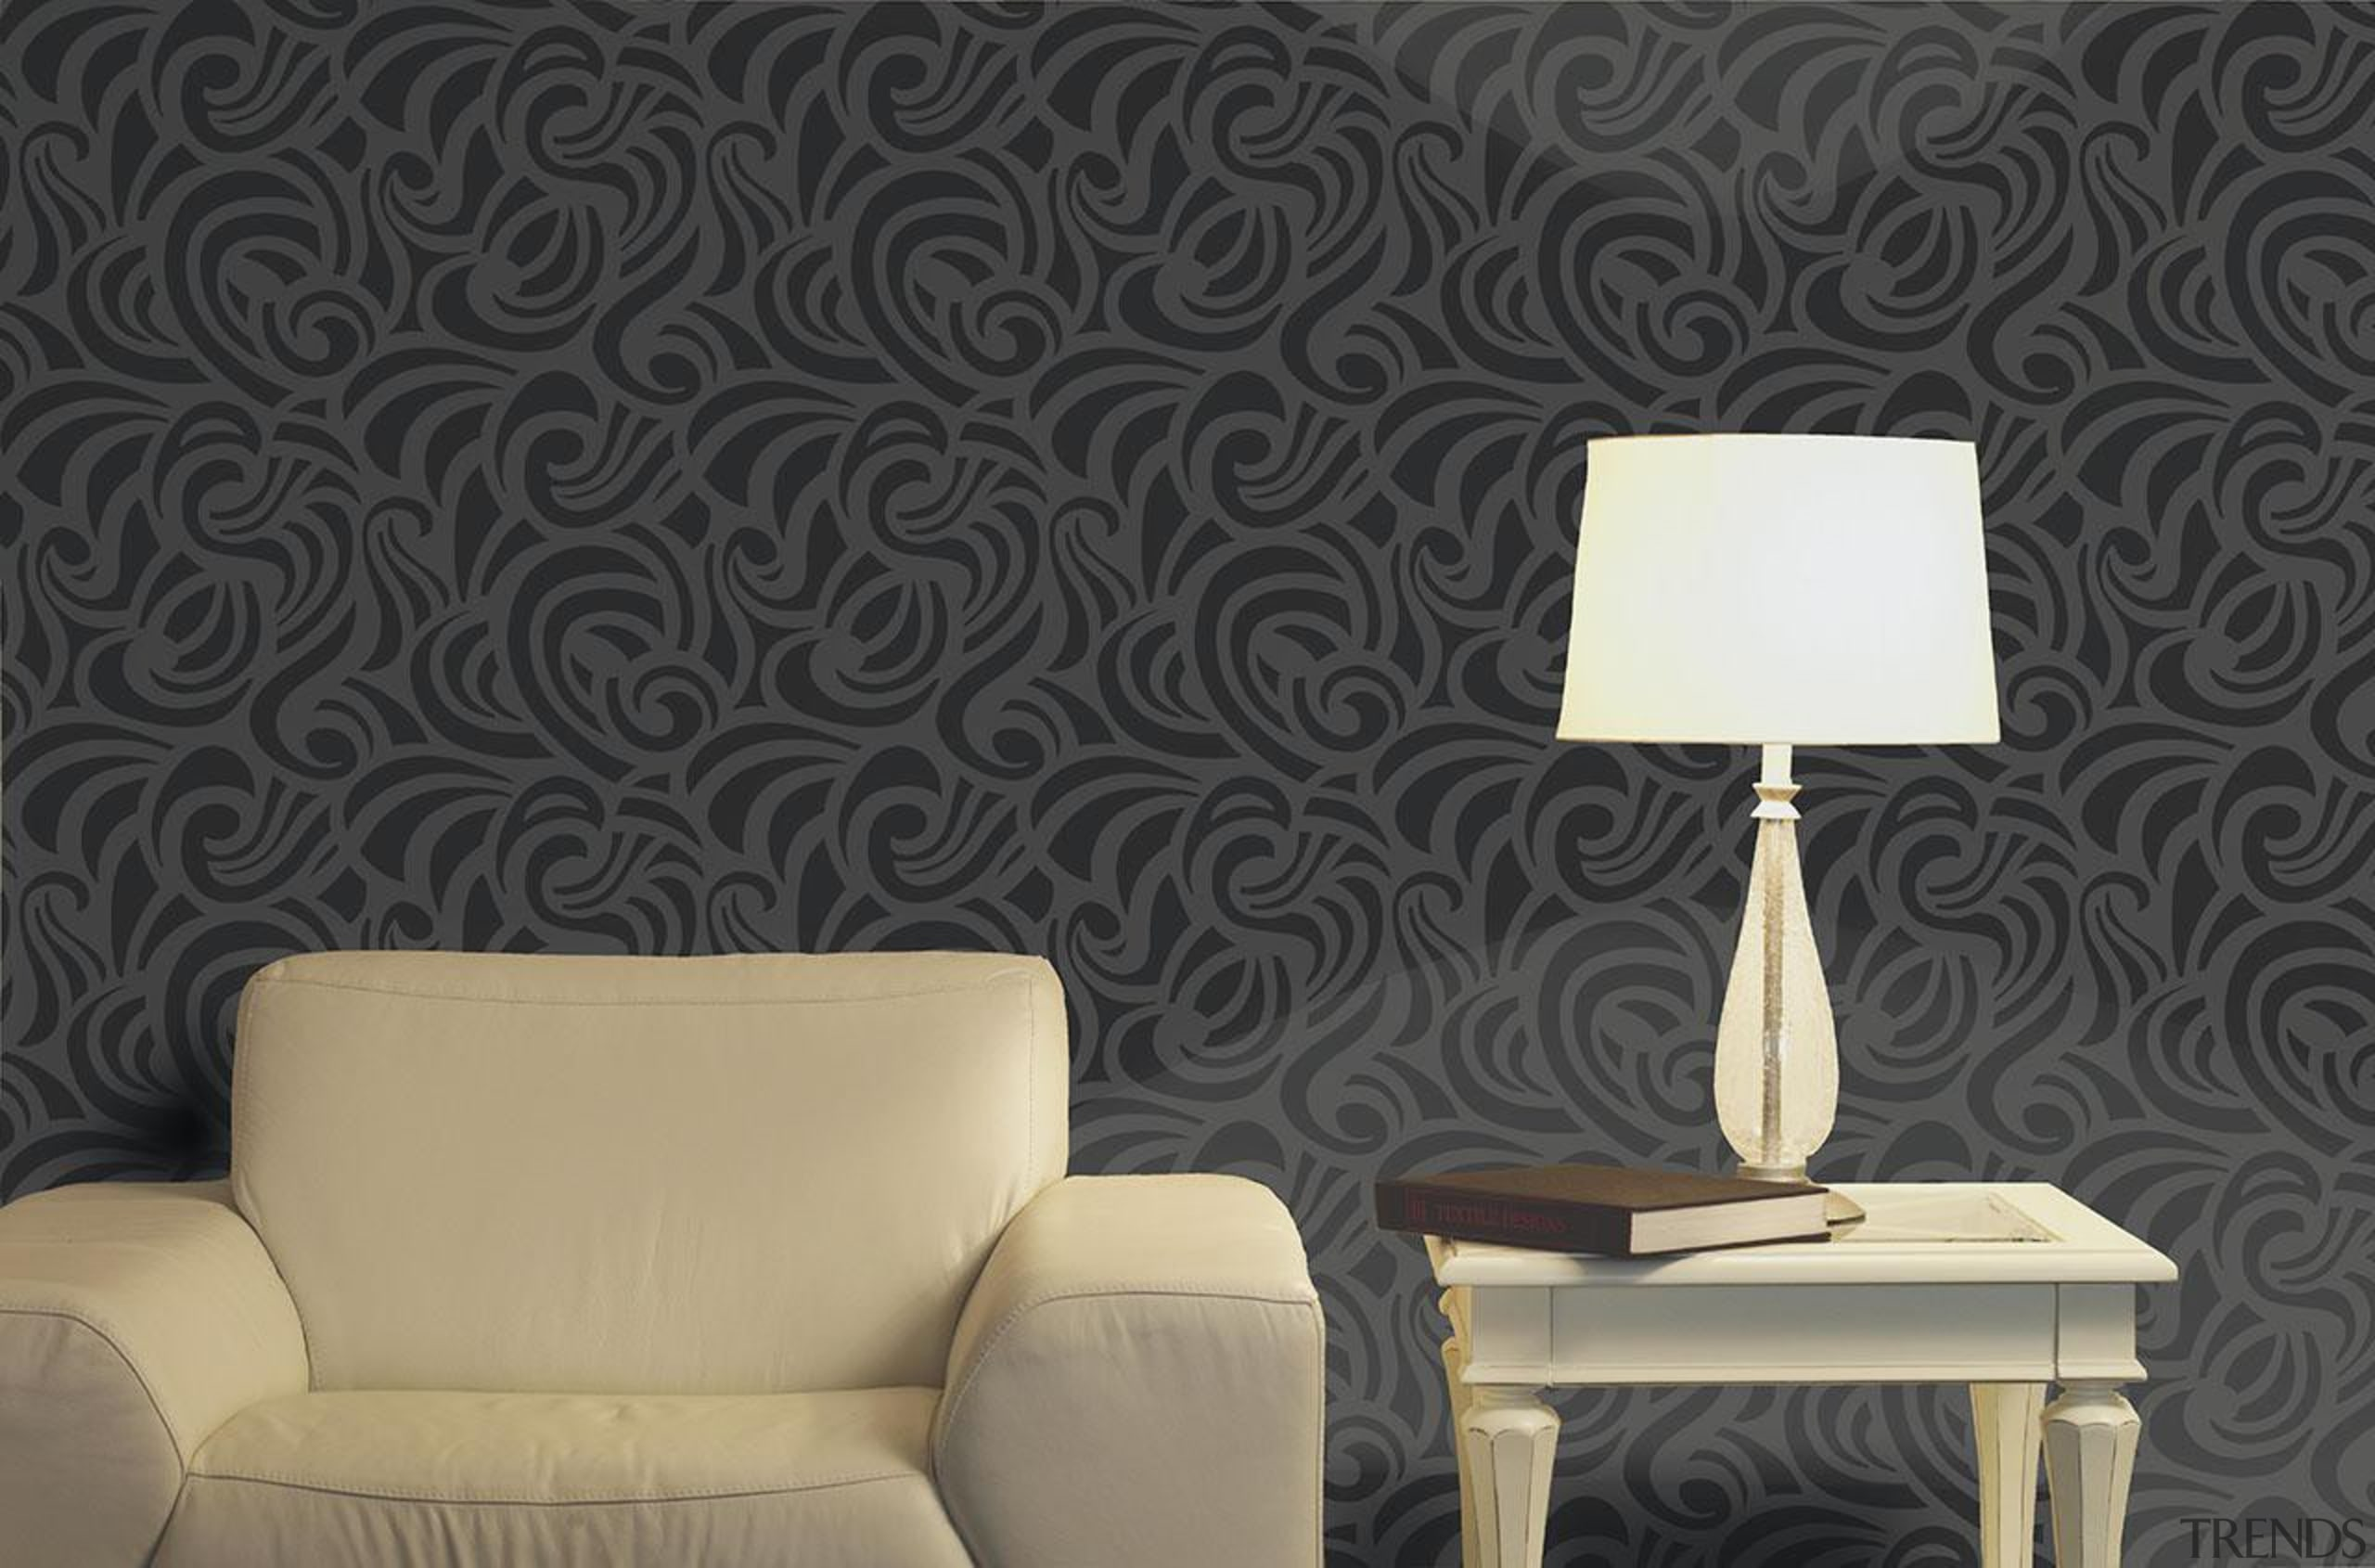 Bloomsbury House - Bloomsbury House Range - interior interior design, pattern, wall, wallpaper, black